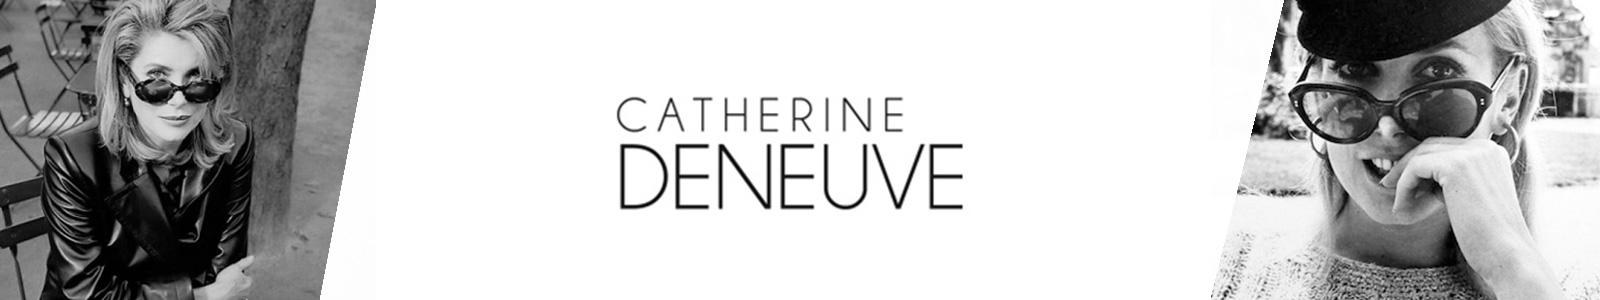 catherine-deneuve